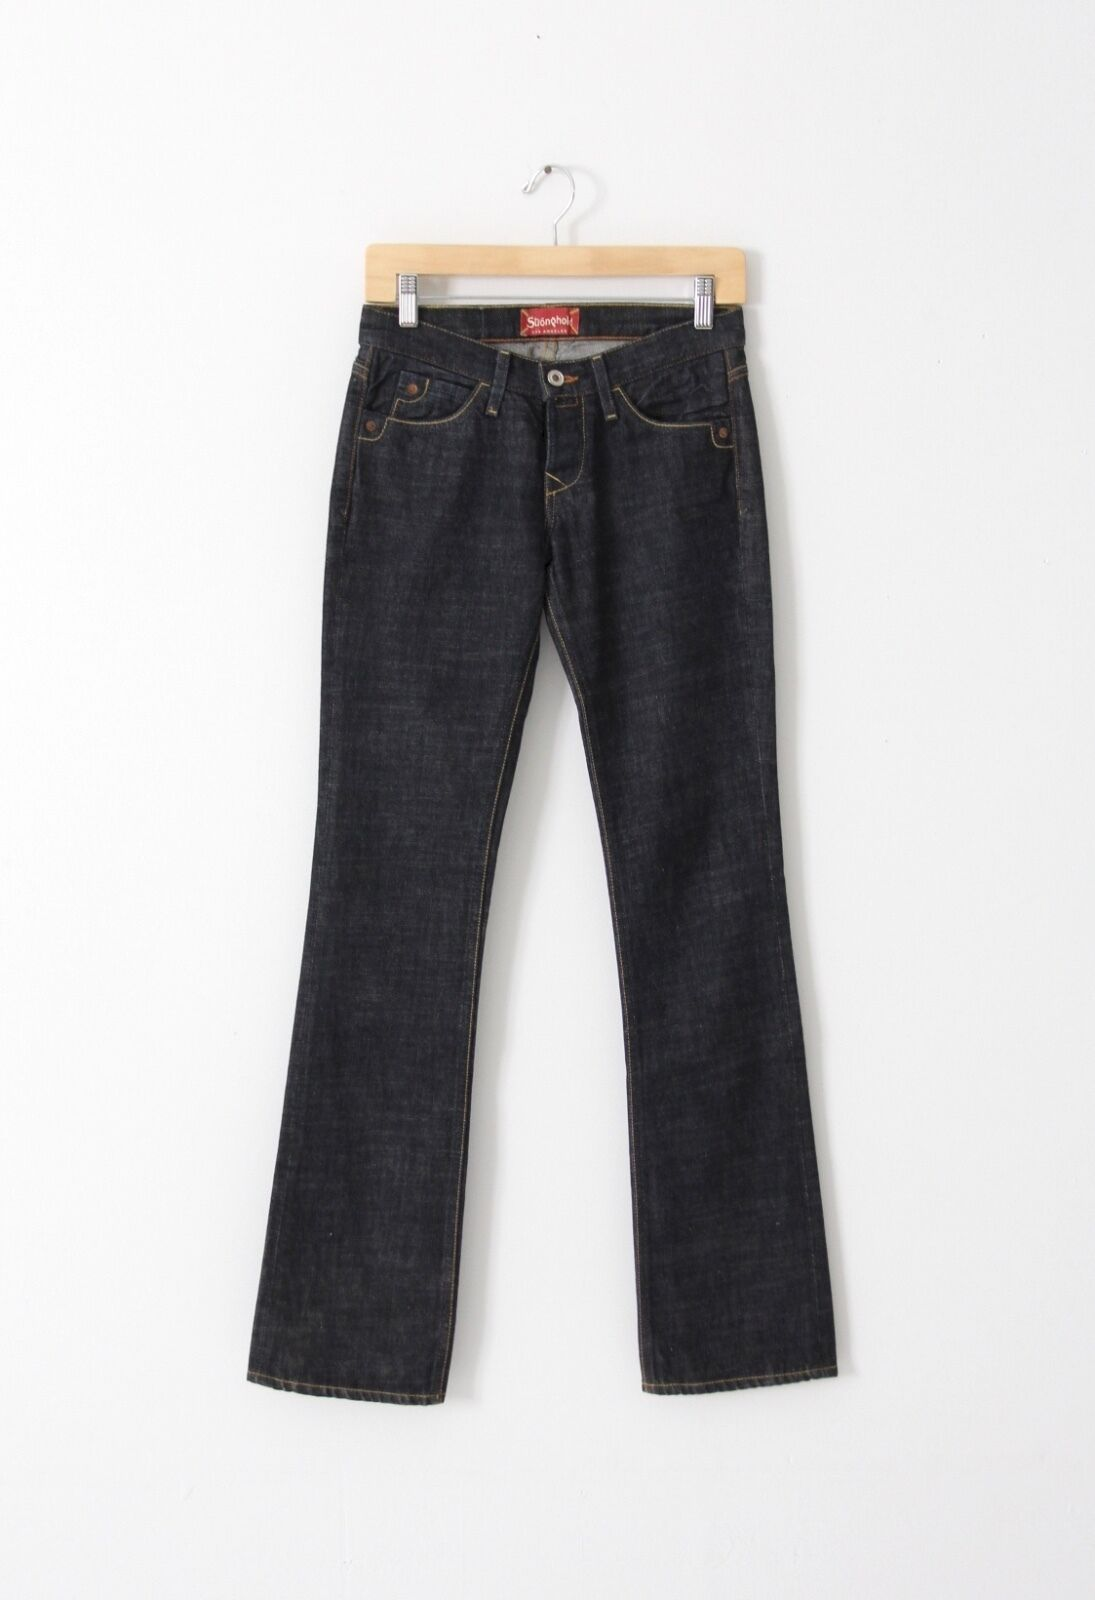 Stronghold denim jeans, women's bootcut dark wash jeans size 25